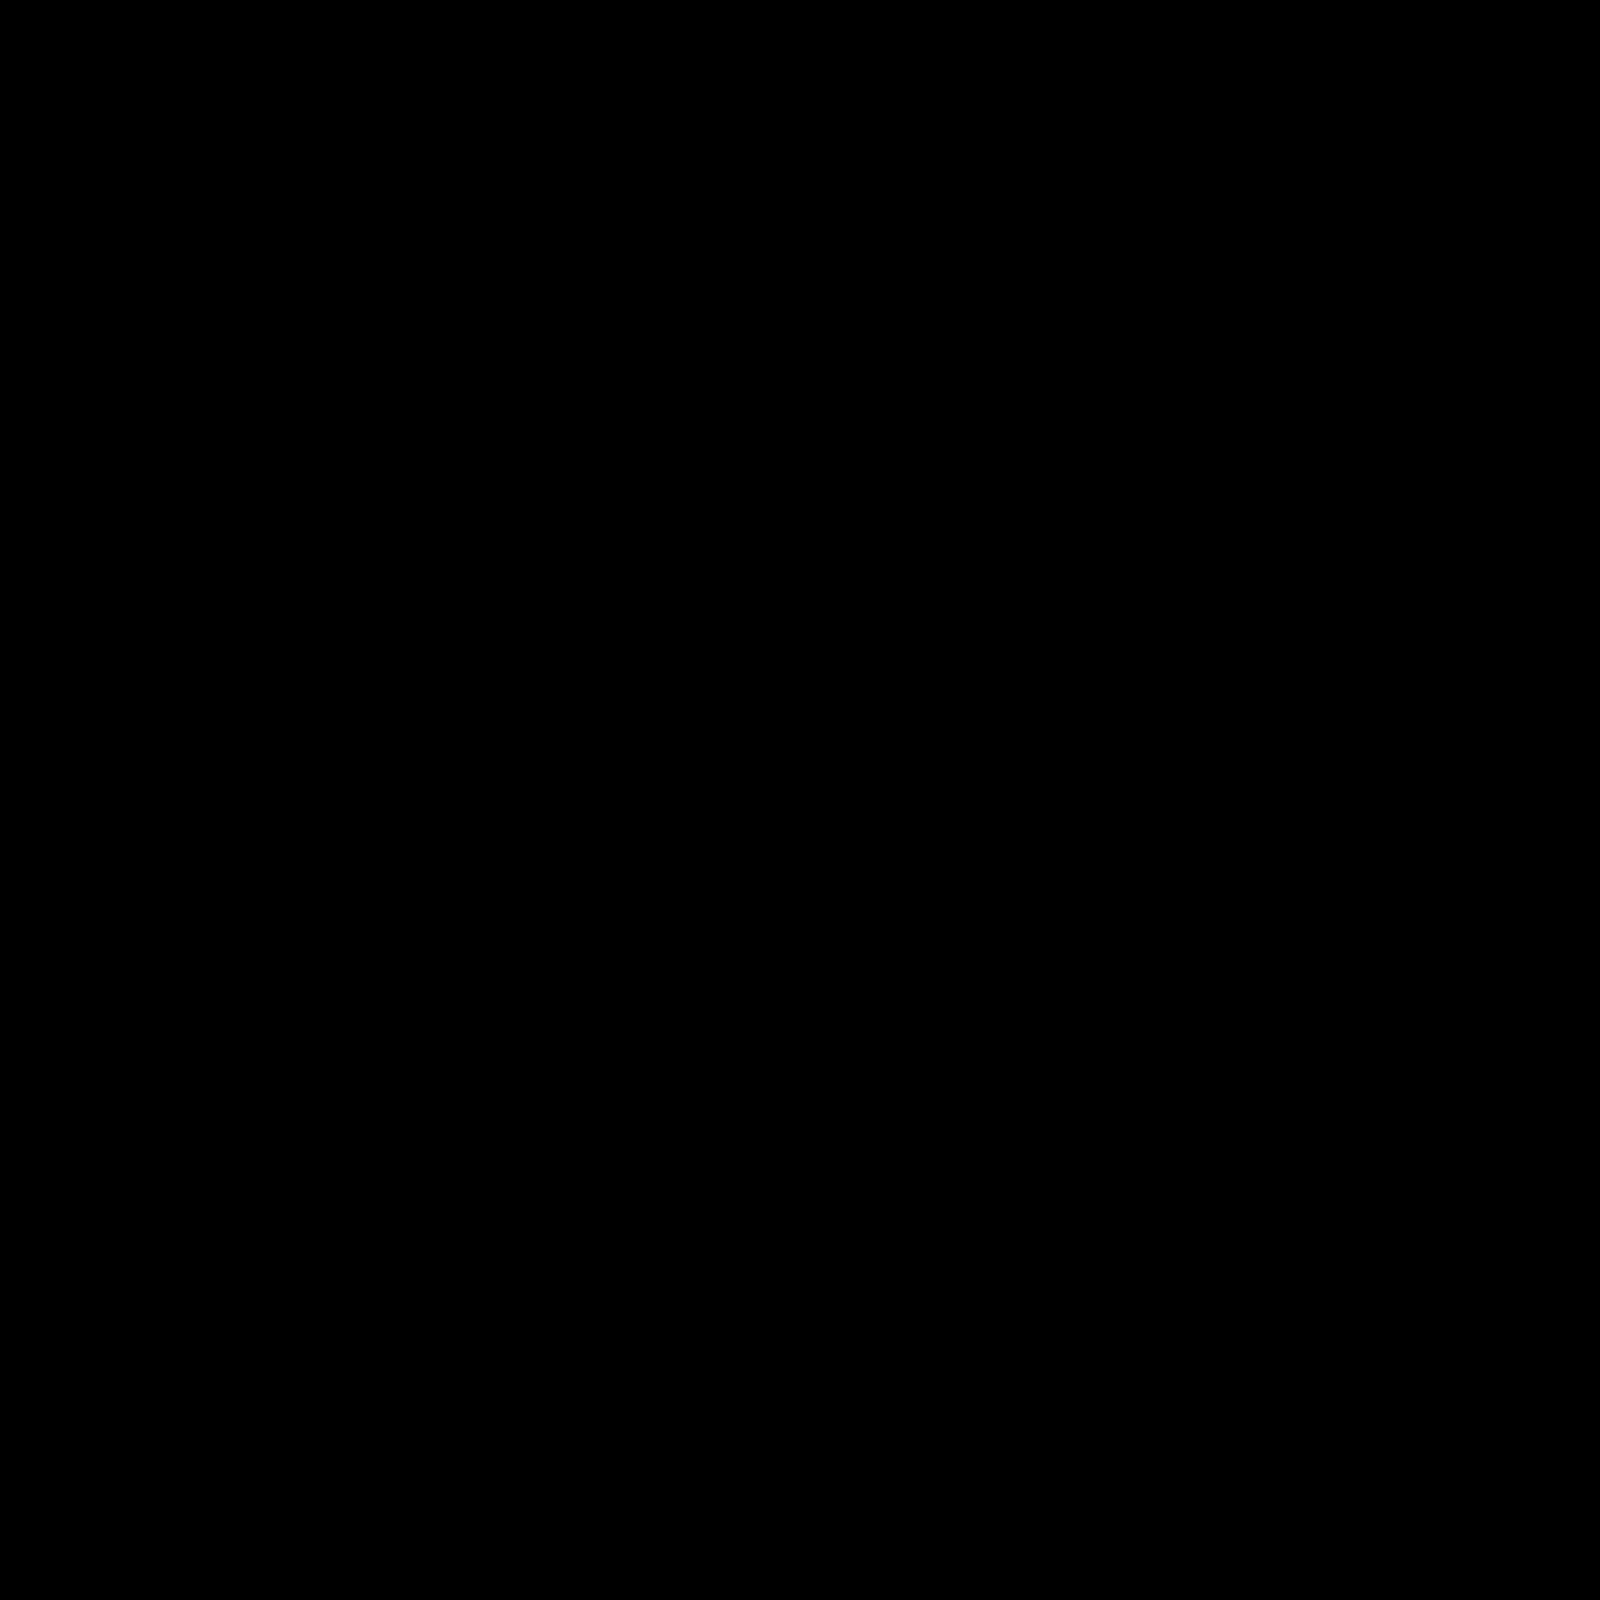 Cheburashka Filled icon